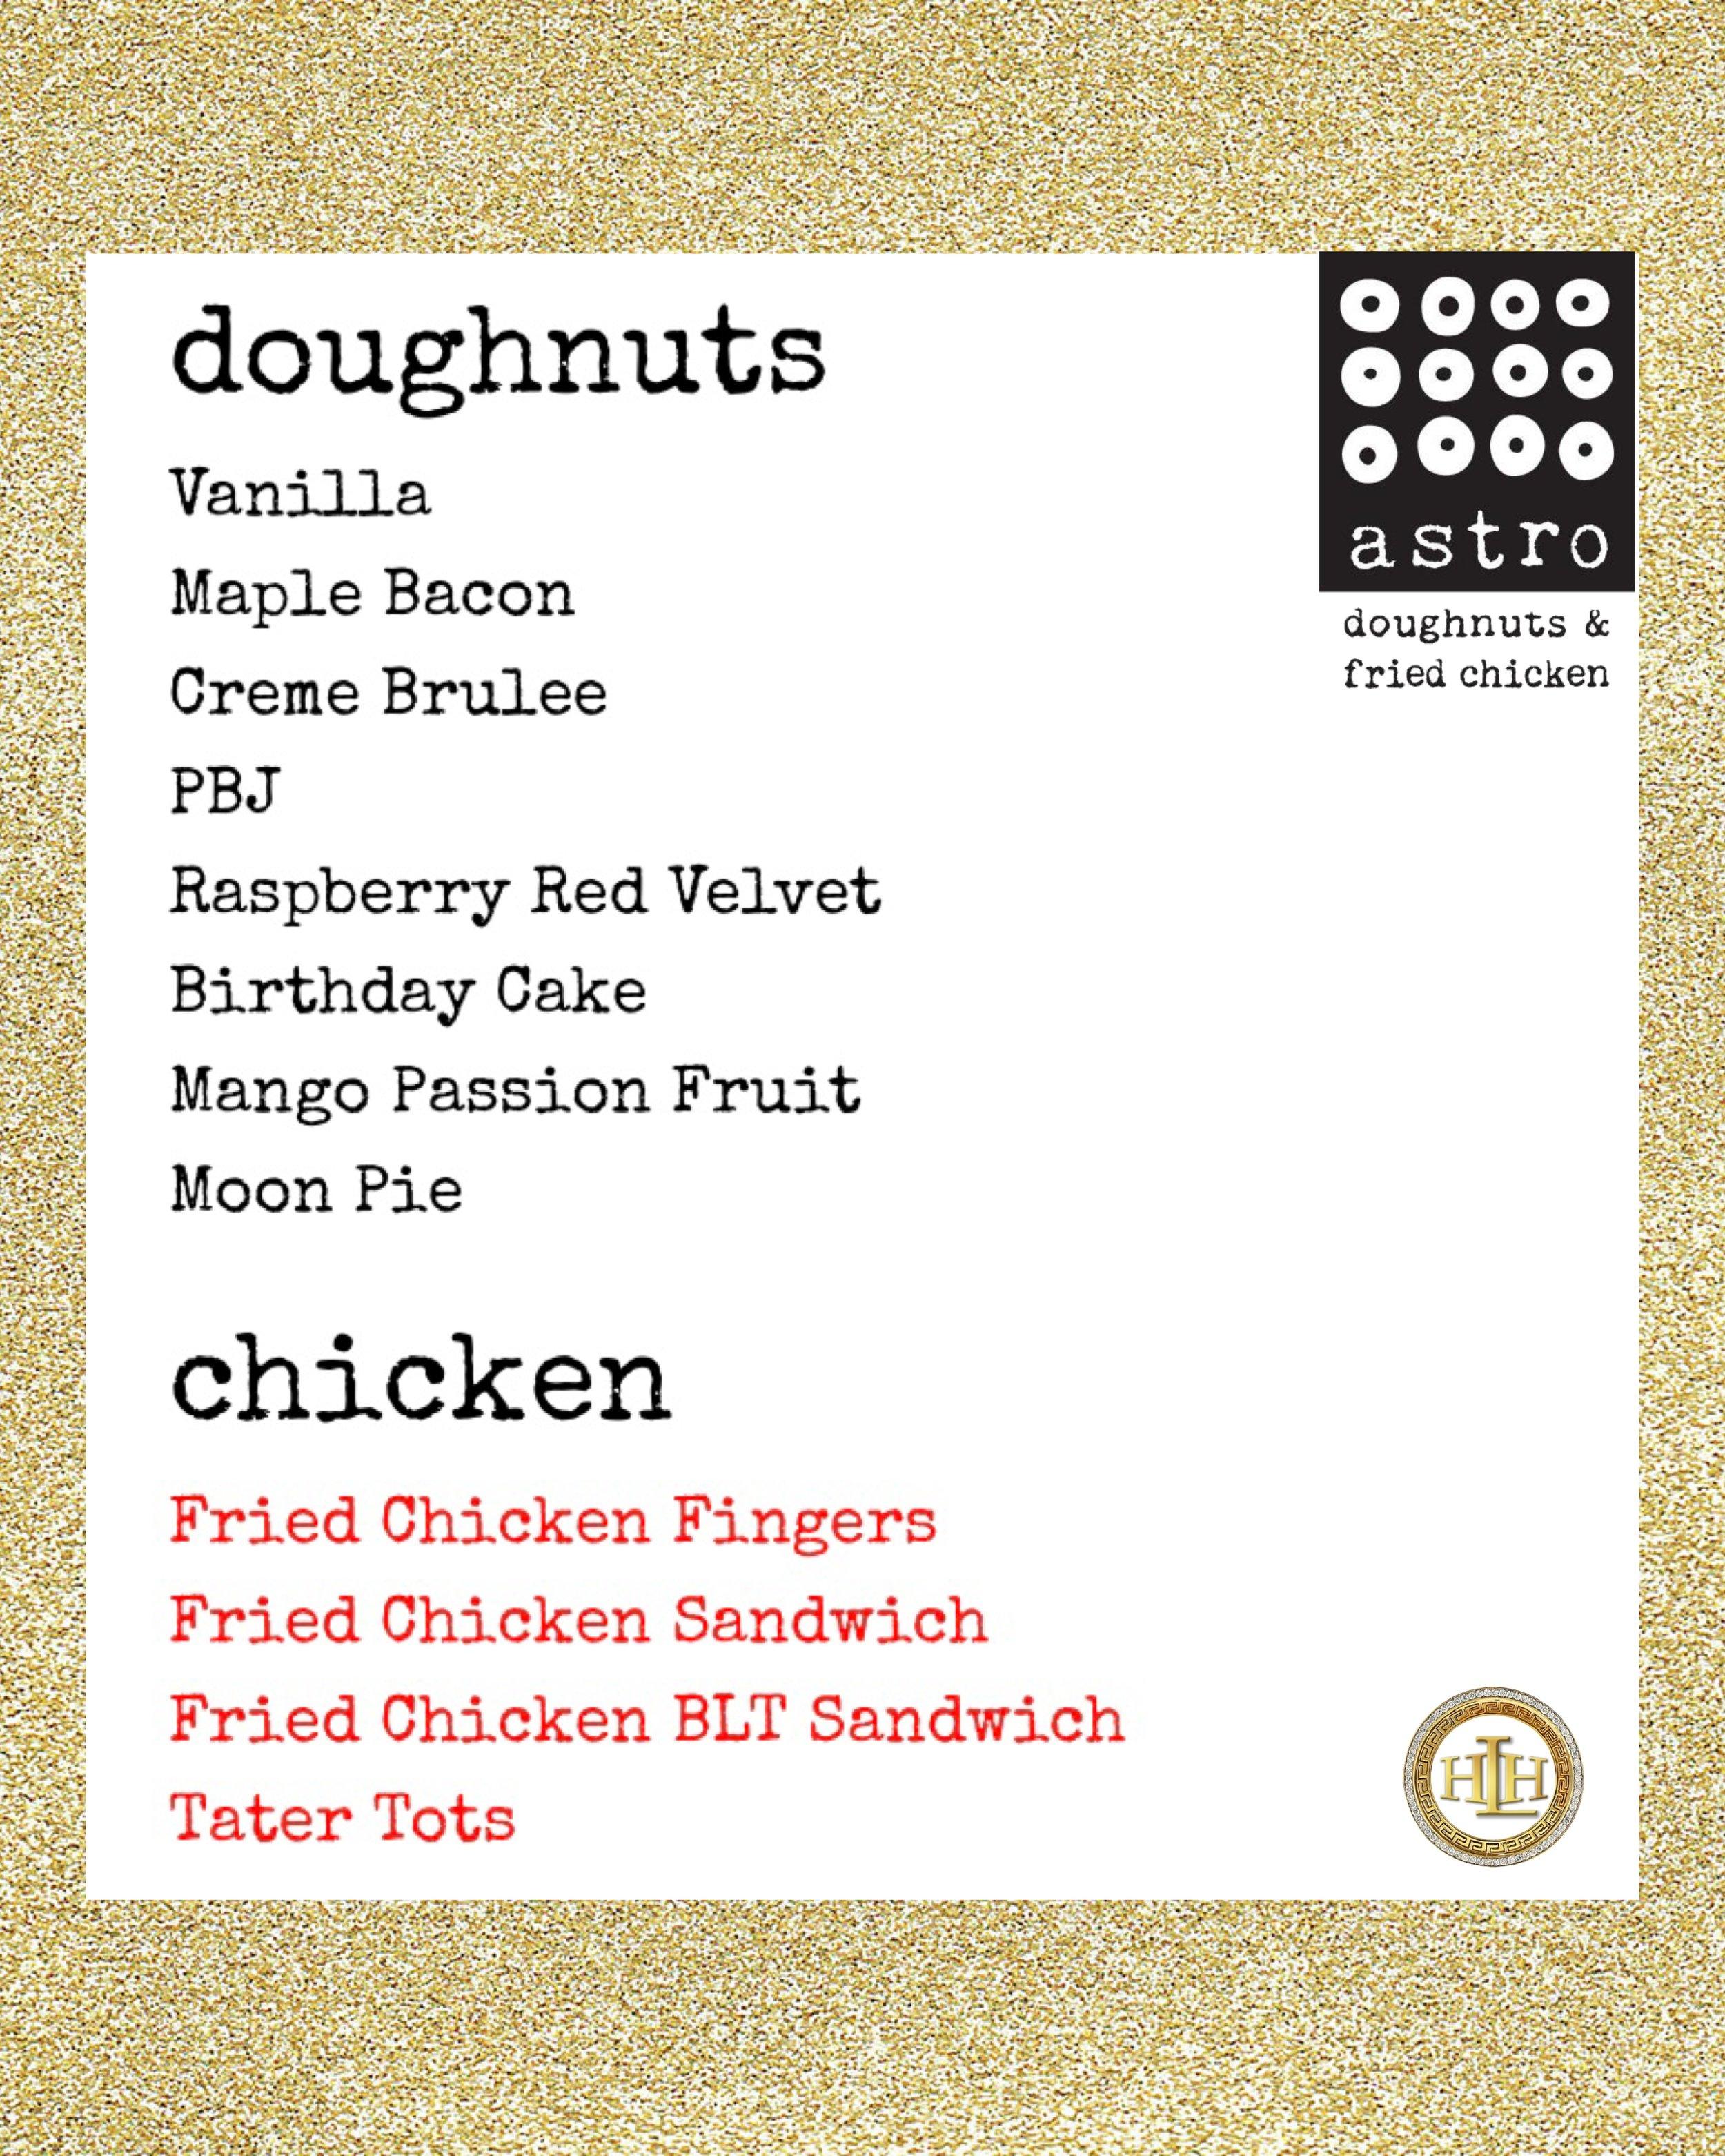 ASTRO DOUGHNUTS - FOOD TRUCK